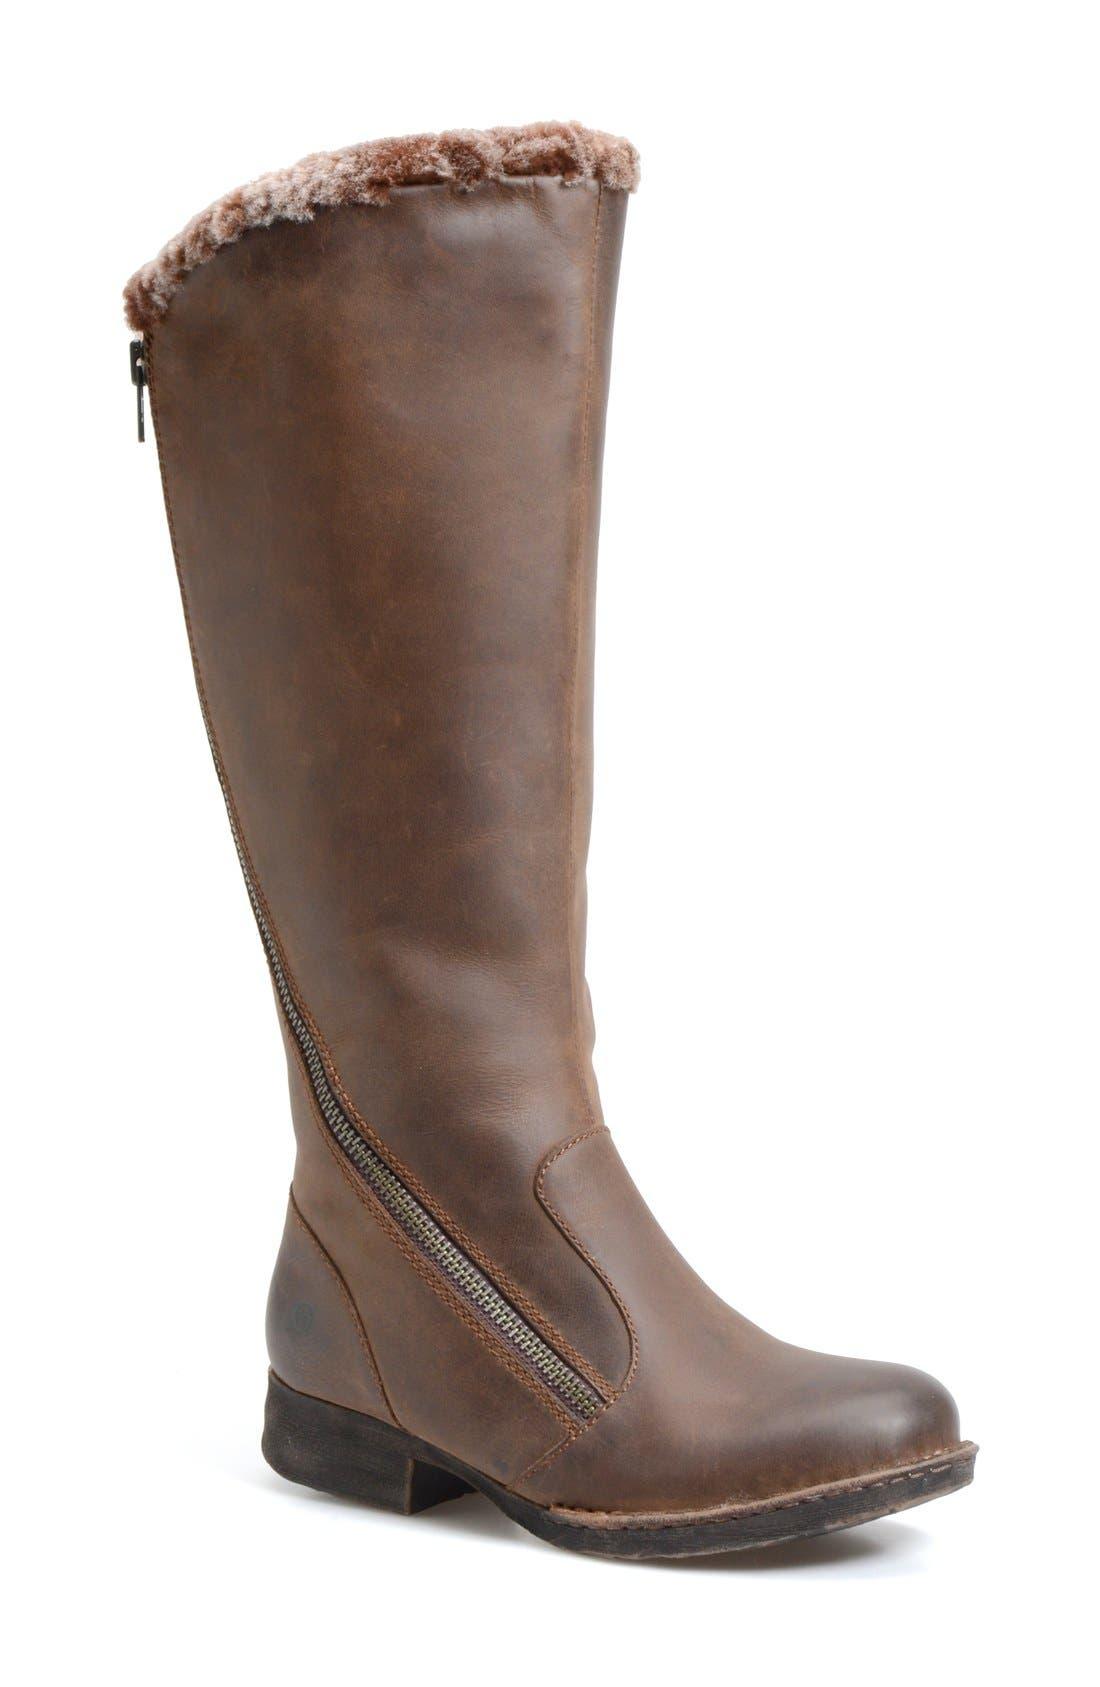 Alternate Image 1 Selected - Børn 'Muna' Shearling Tall Boot